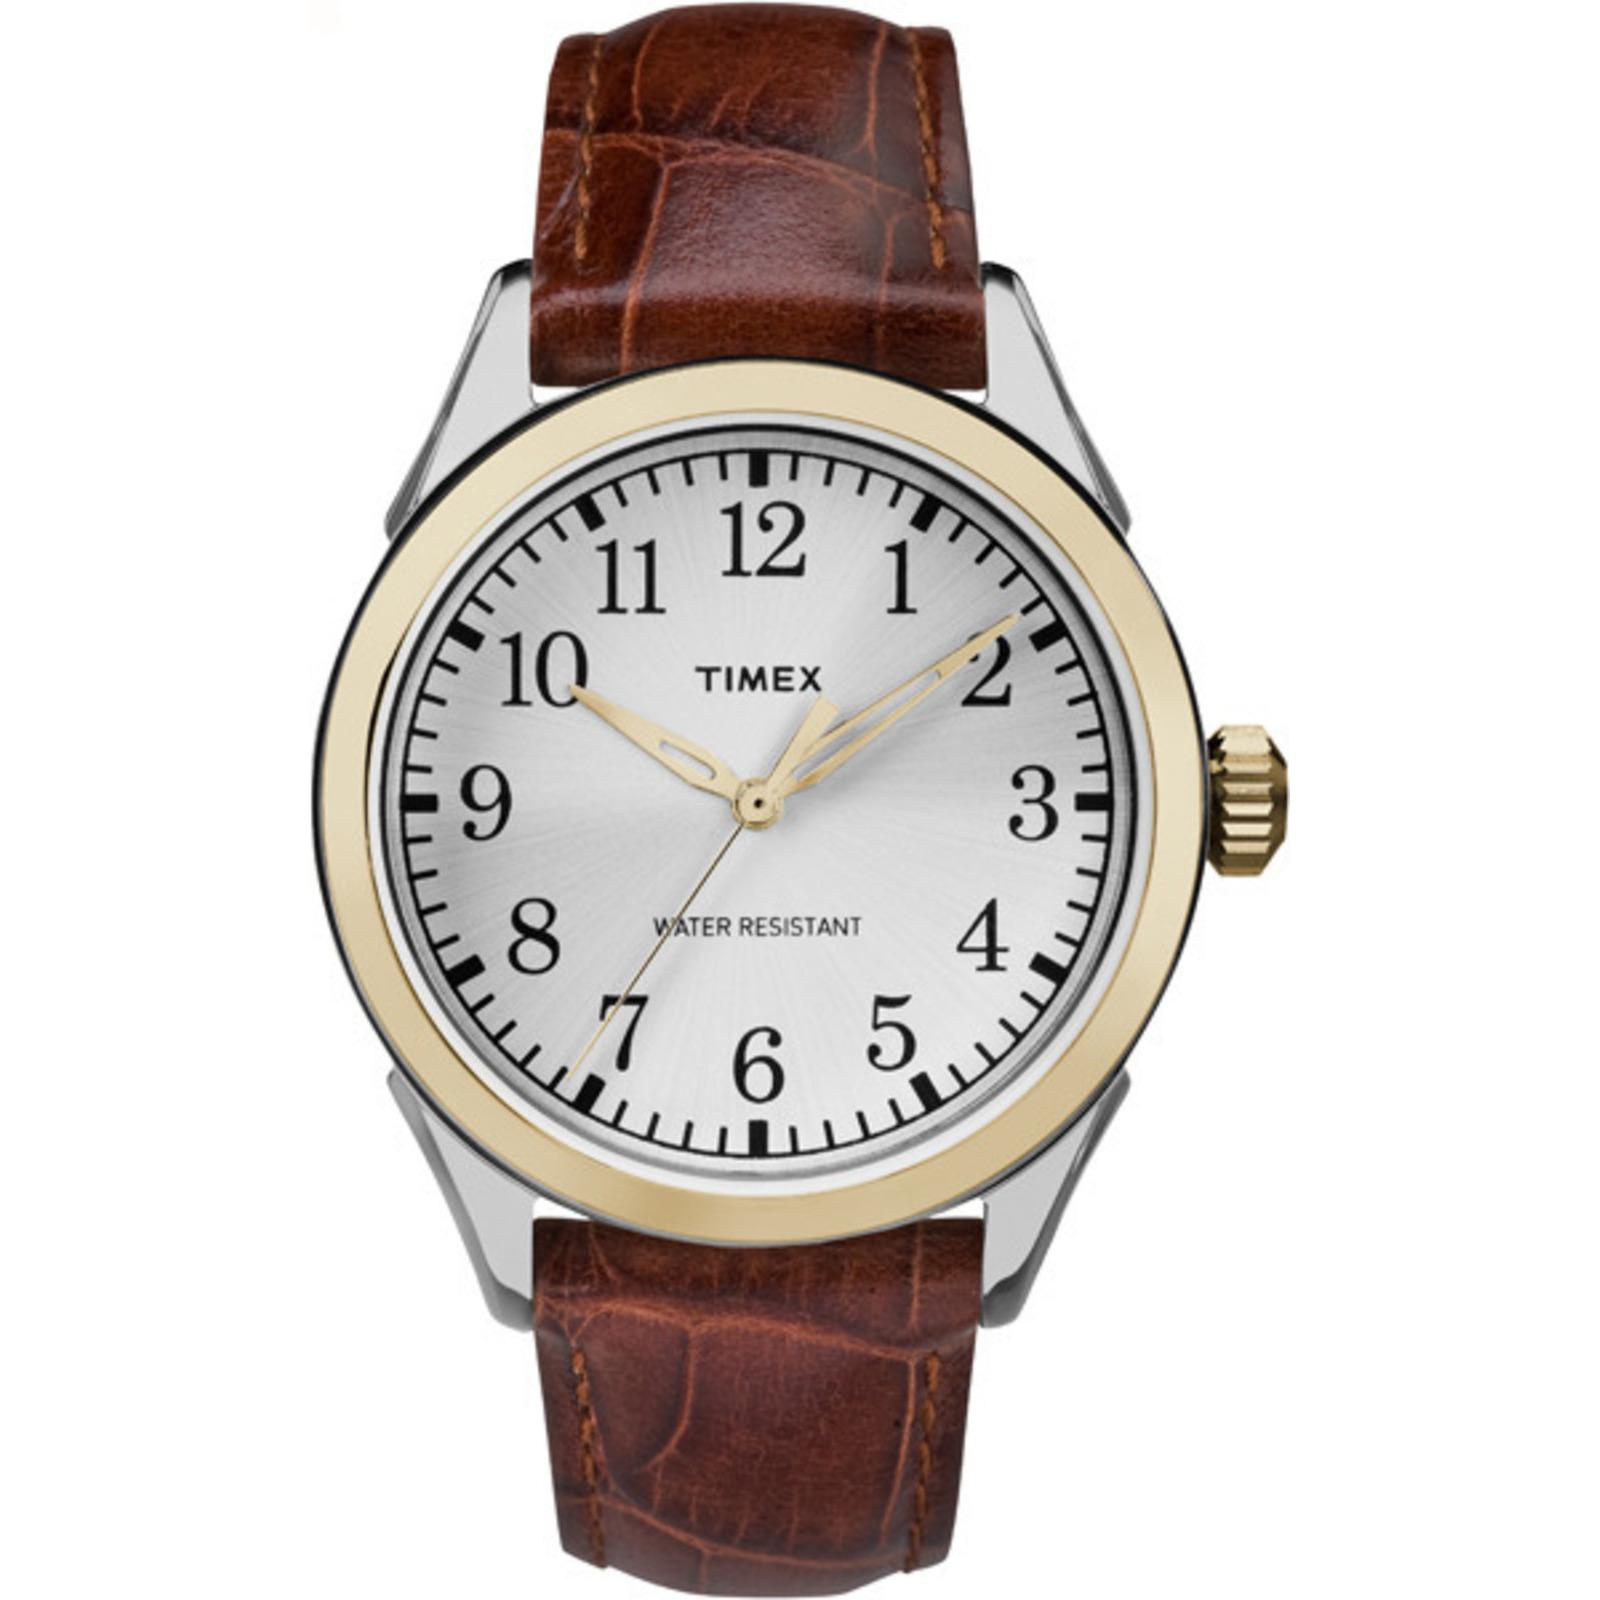 Timex Men's Briarwood Terrace Leather Strap & Silver-Tone Di